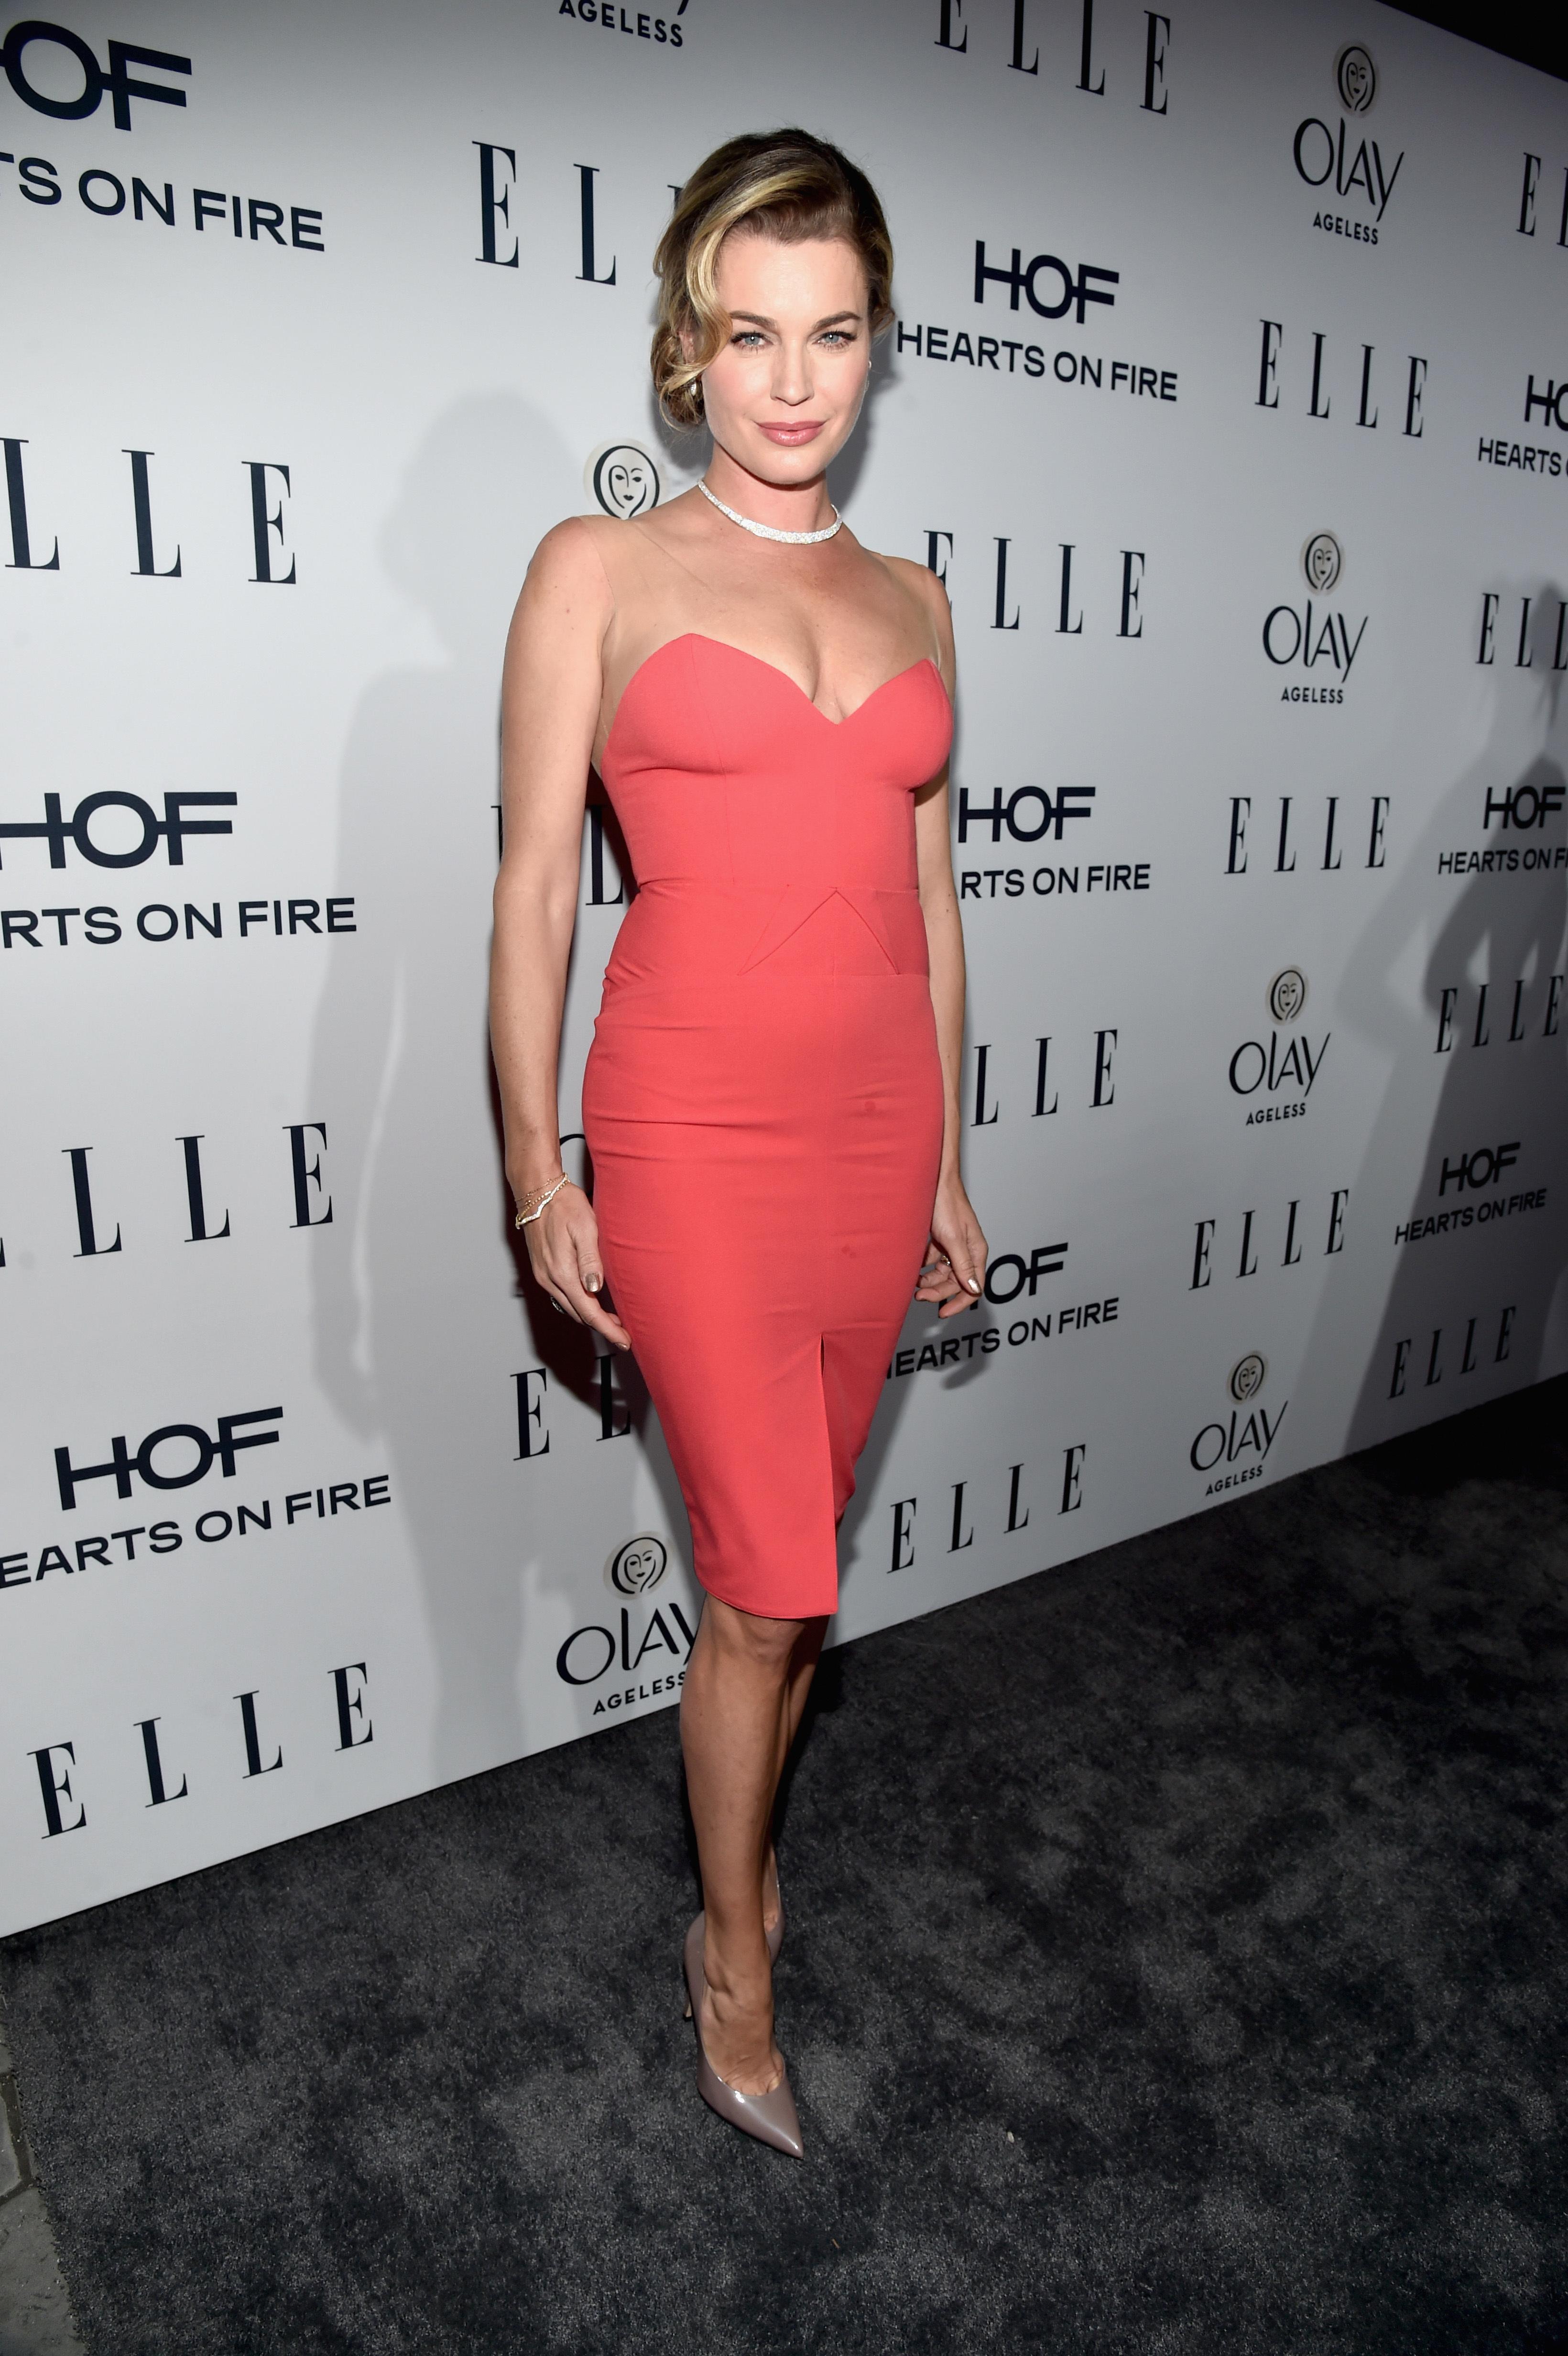 Rebecca Romijn: Kendall Jenner, Gigi Hadid are not true supermodels